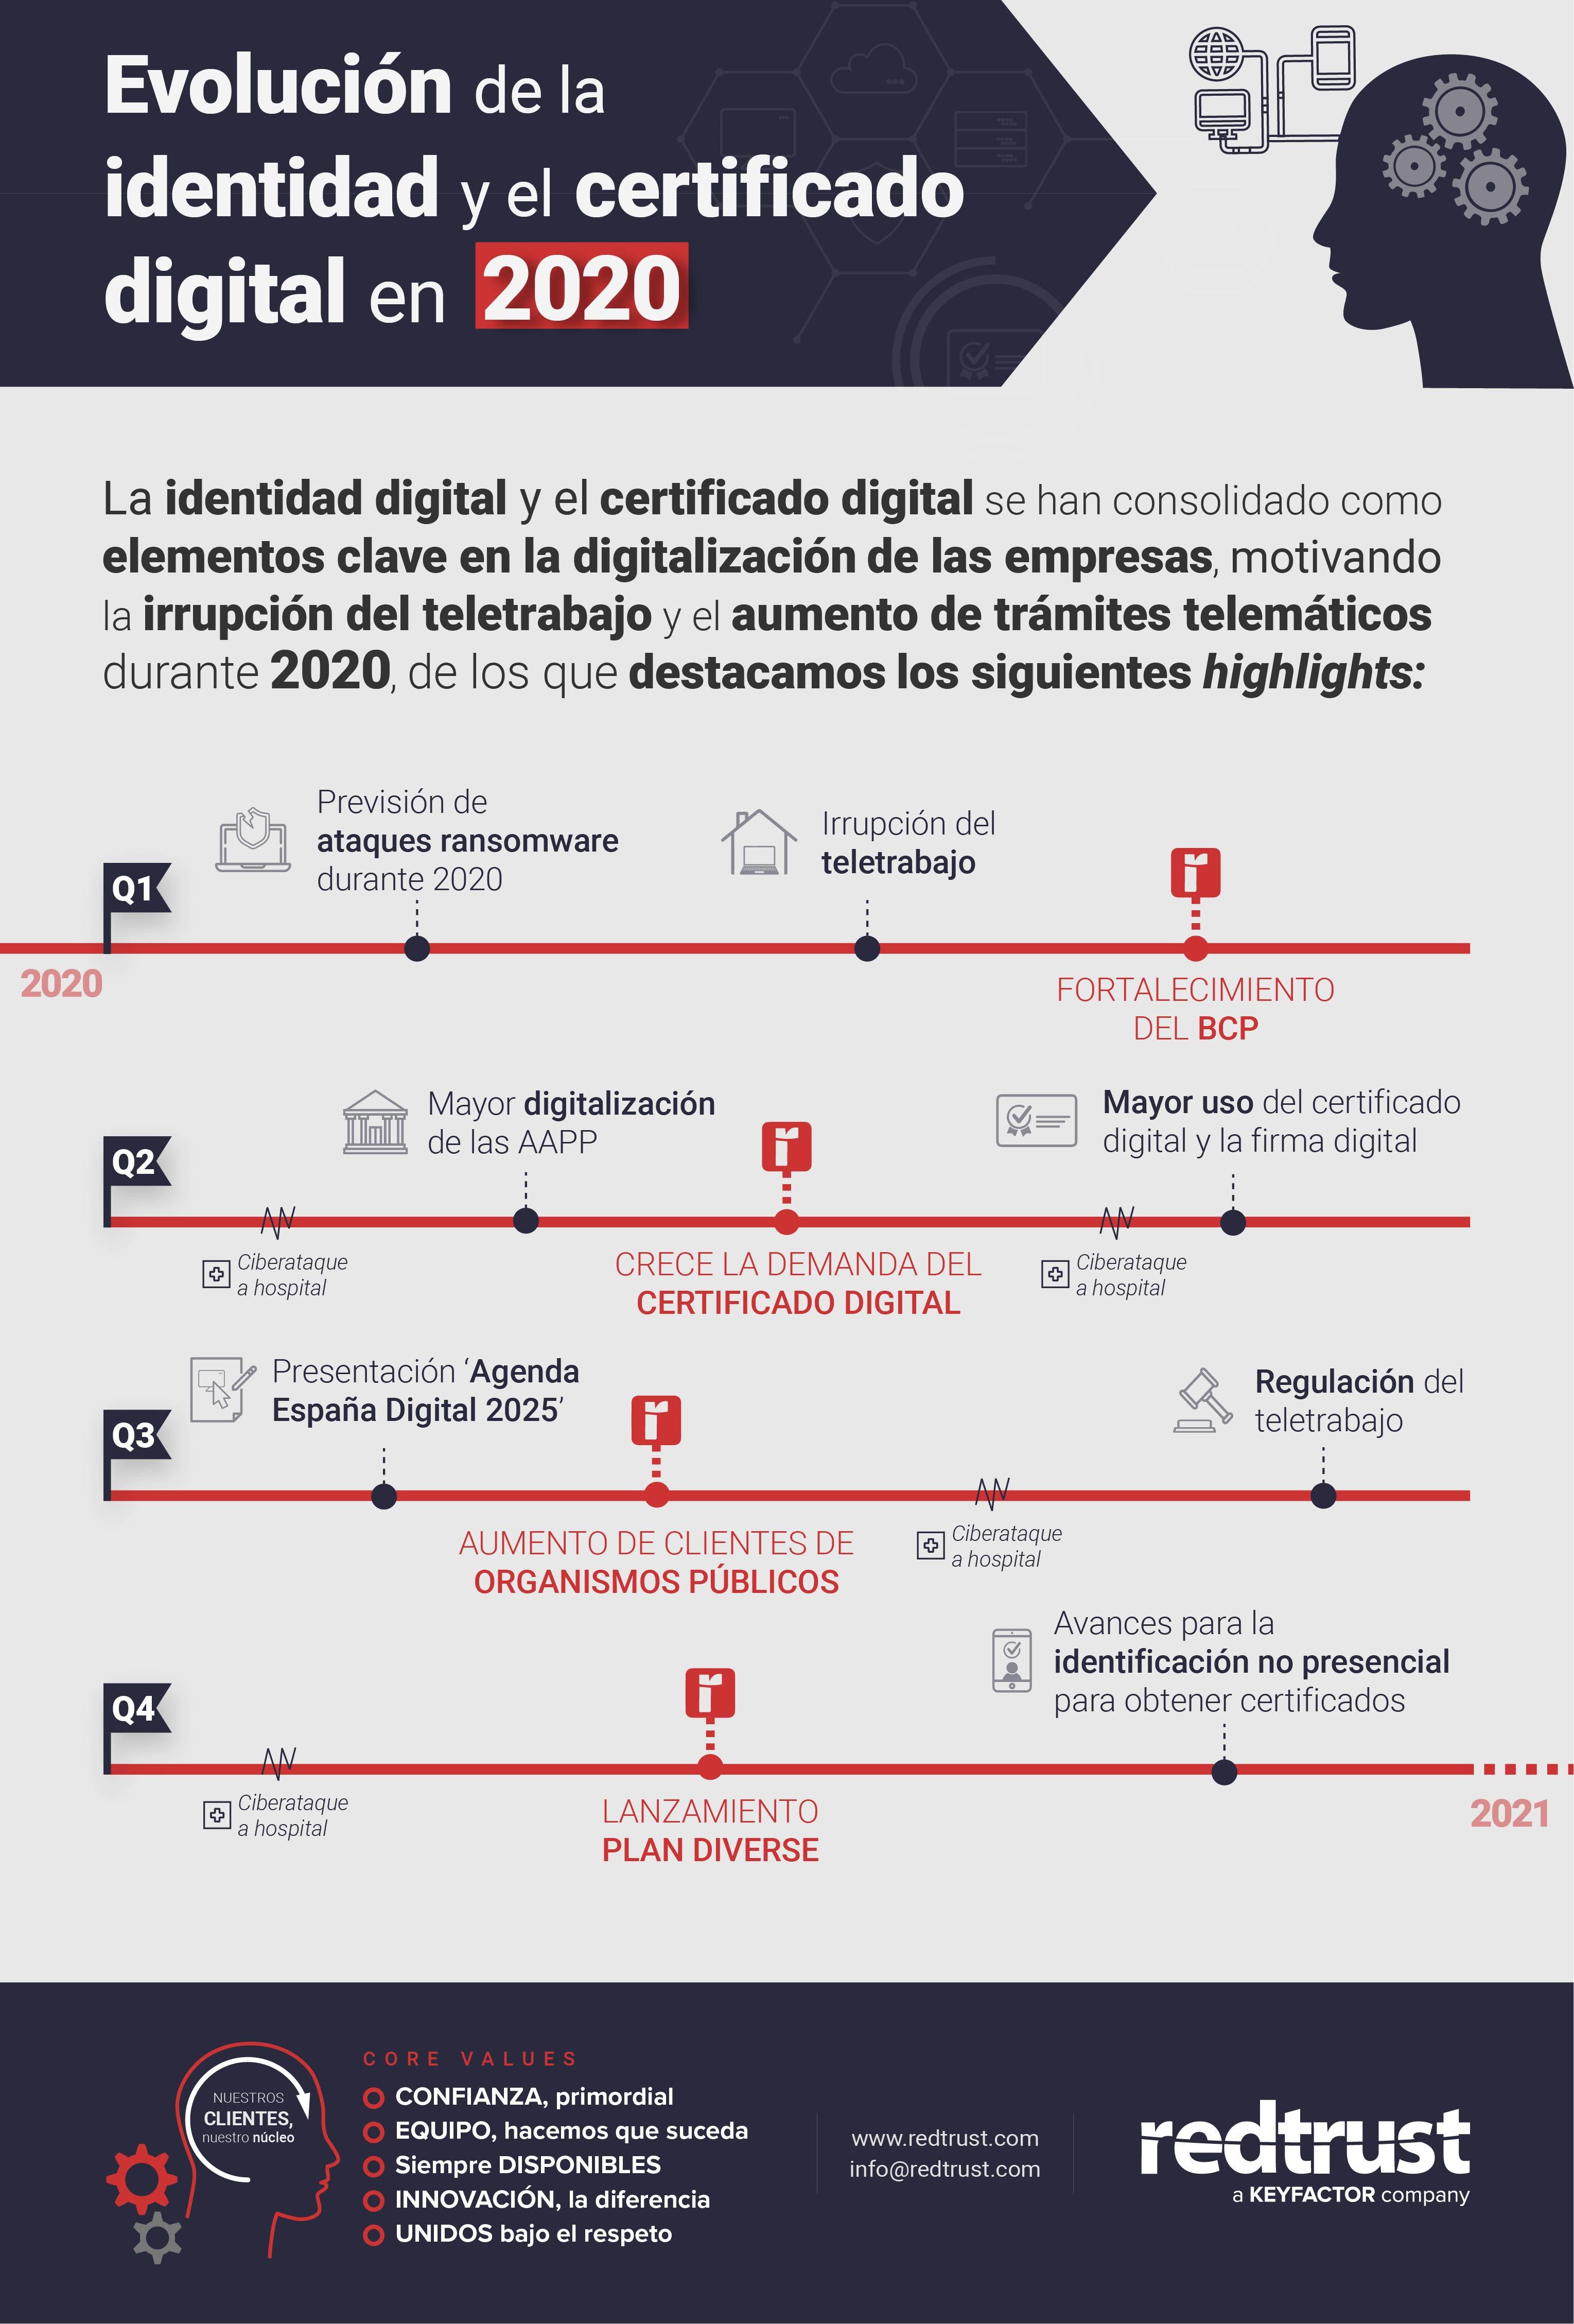 https://redtrust.com/wp-content/uploads/2020/12/infografia-evolucion-identidad-digital-certificado-digital-2020-redtrust.jpg